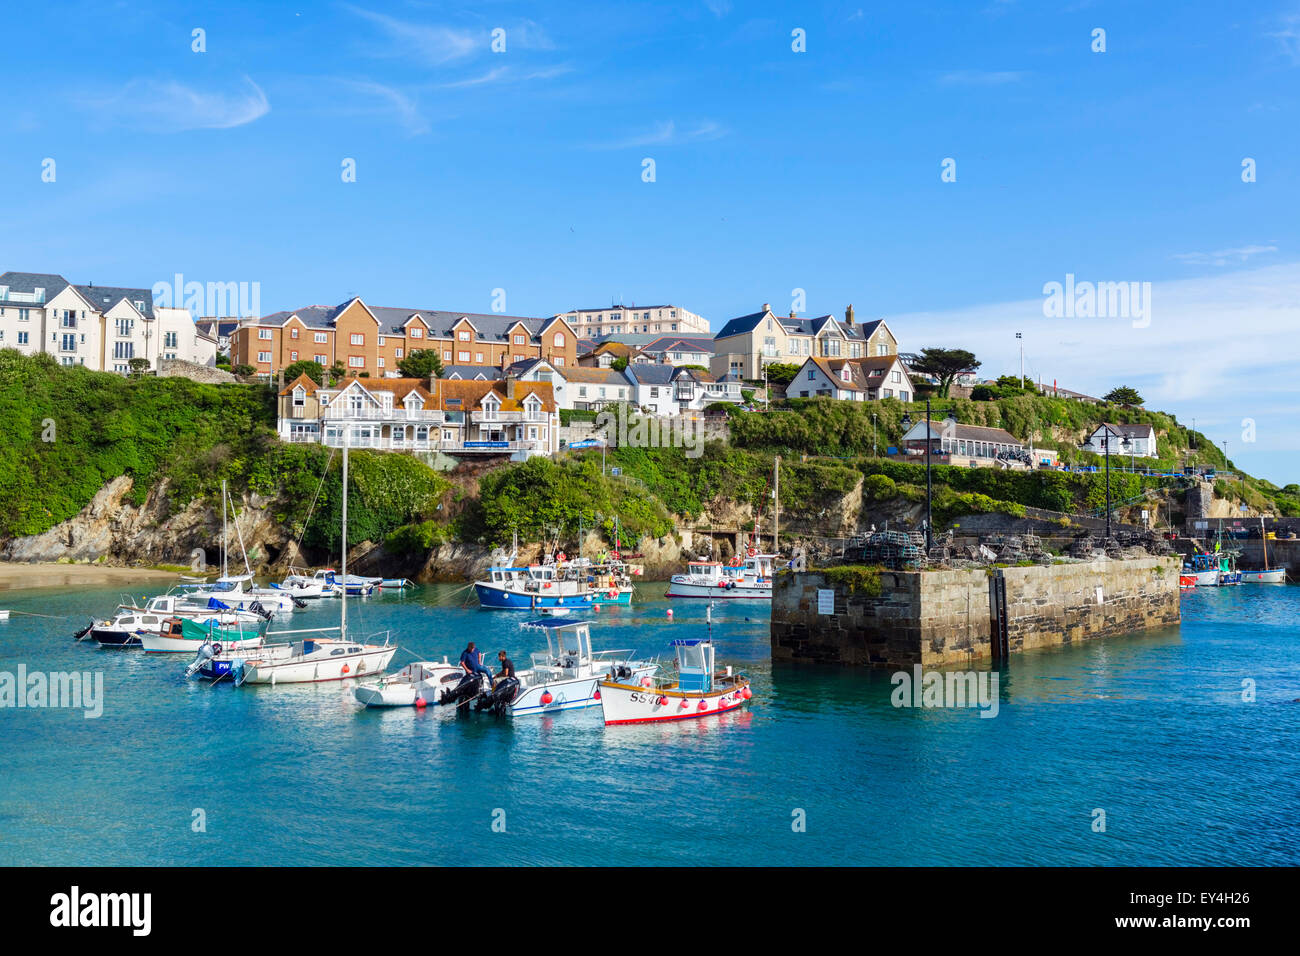 Le port de Newquay, Cornwall, England, UK Photo Stock